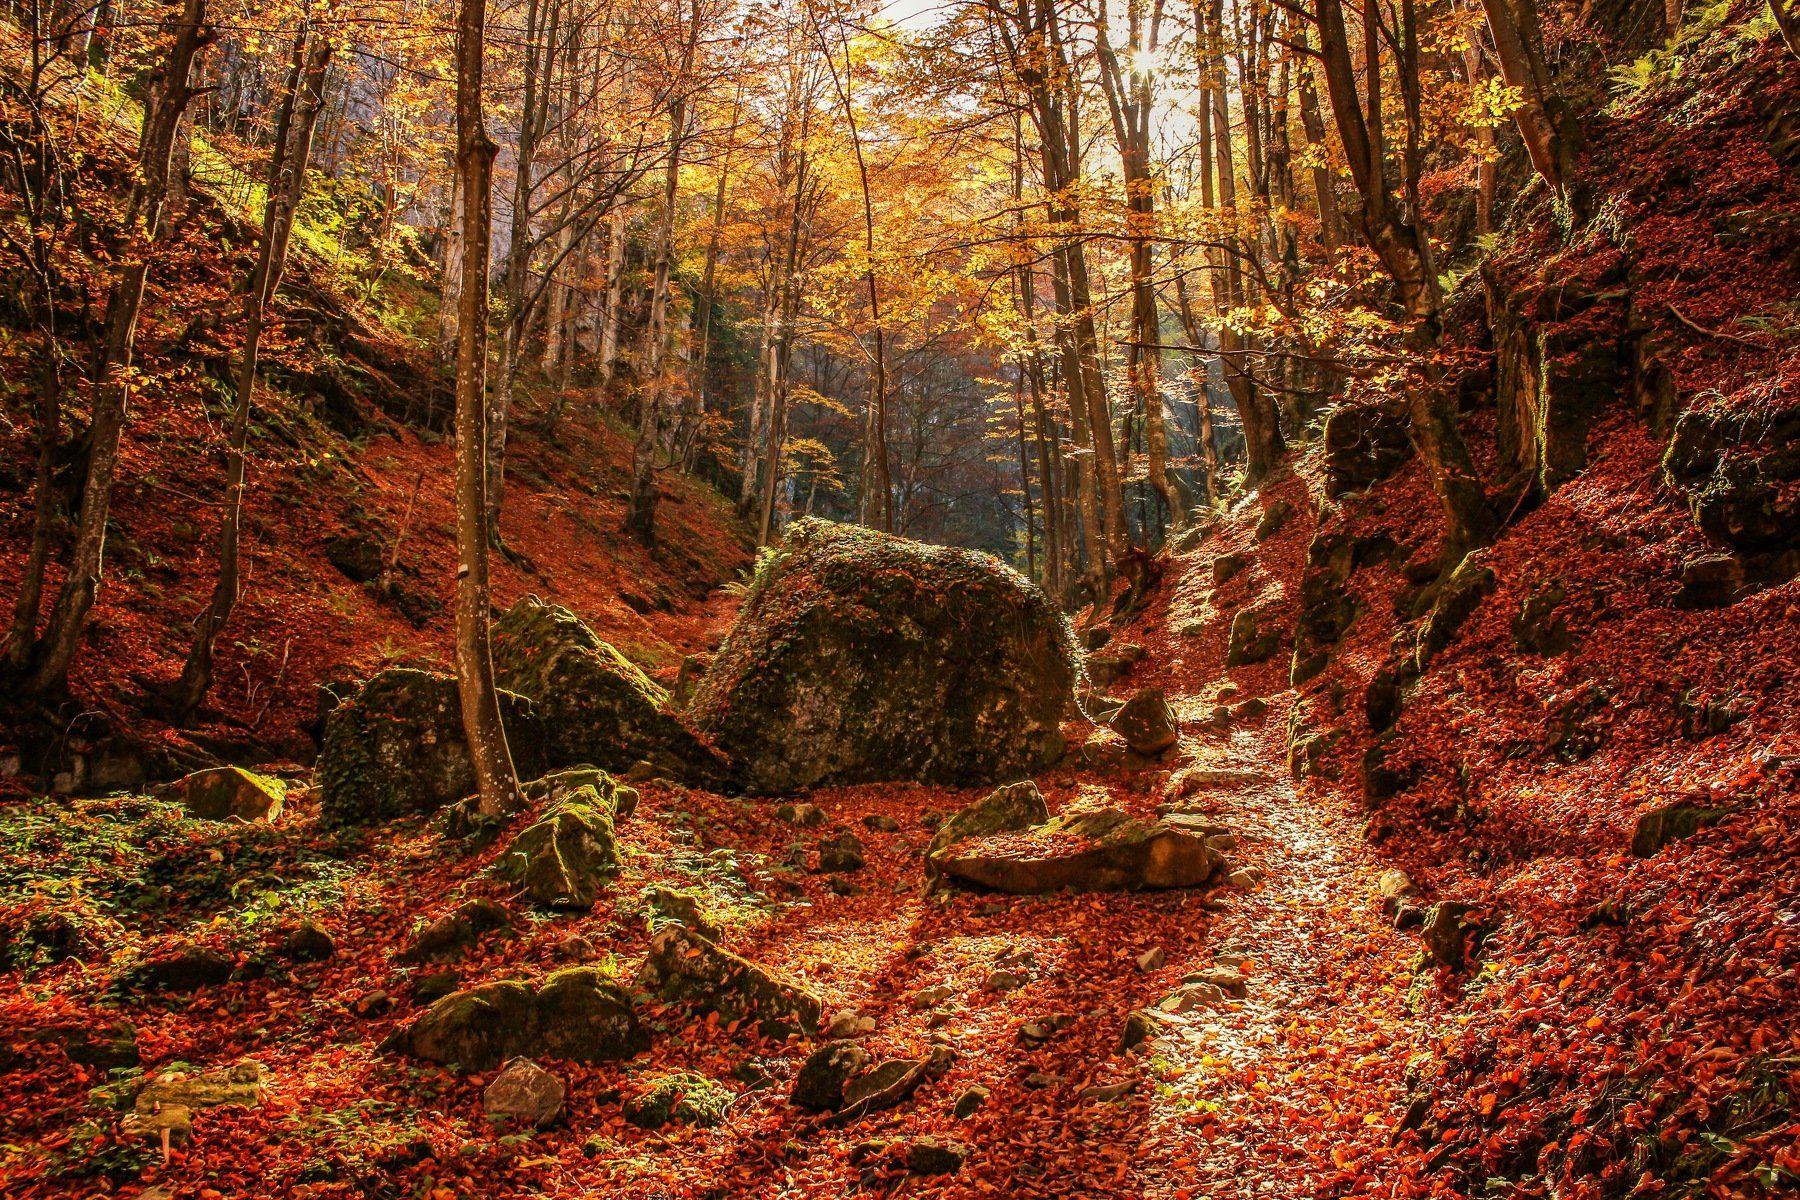 Welcome to Narnia Bistra Stoimenova